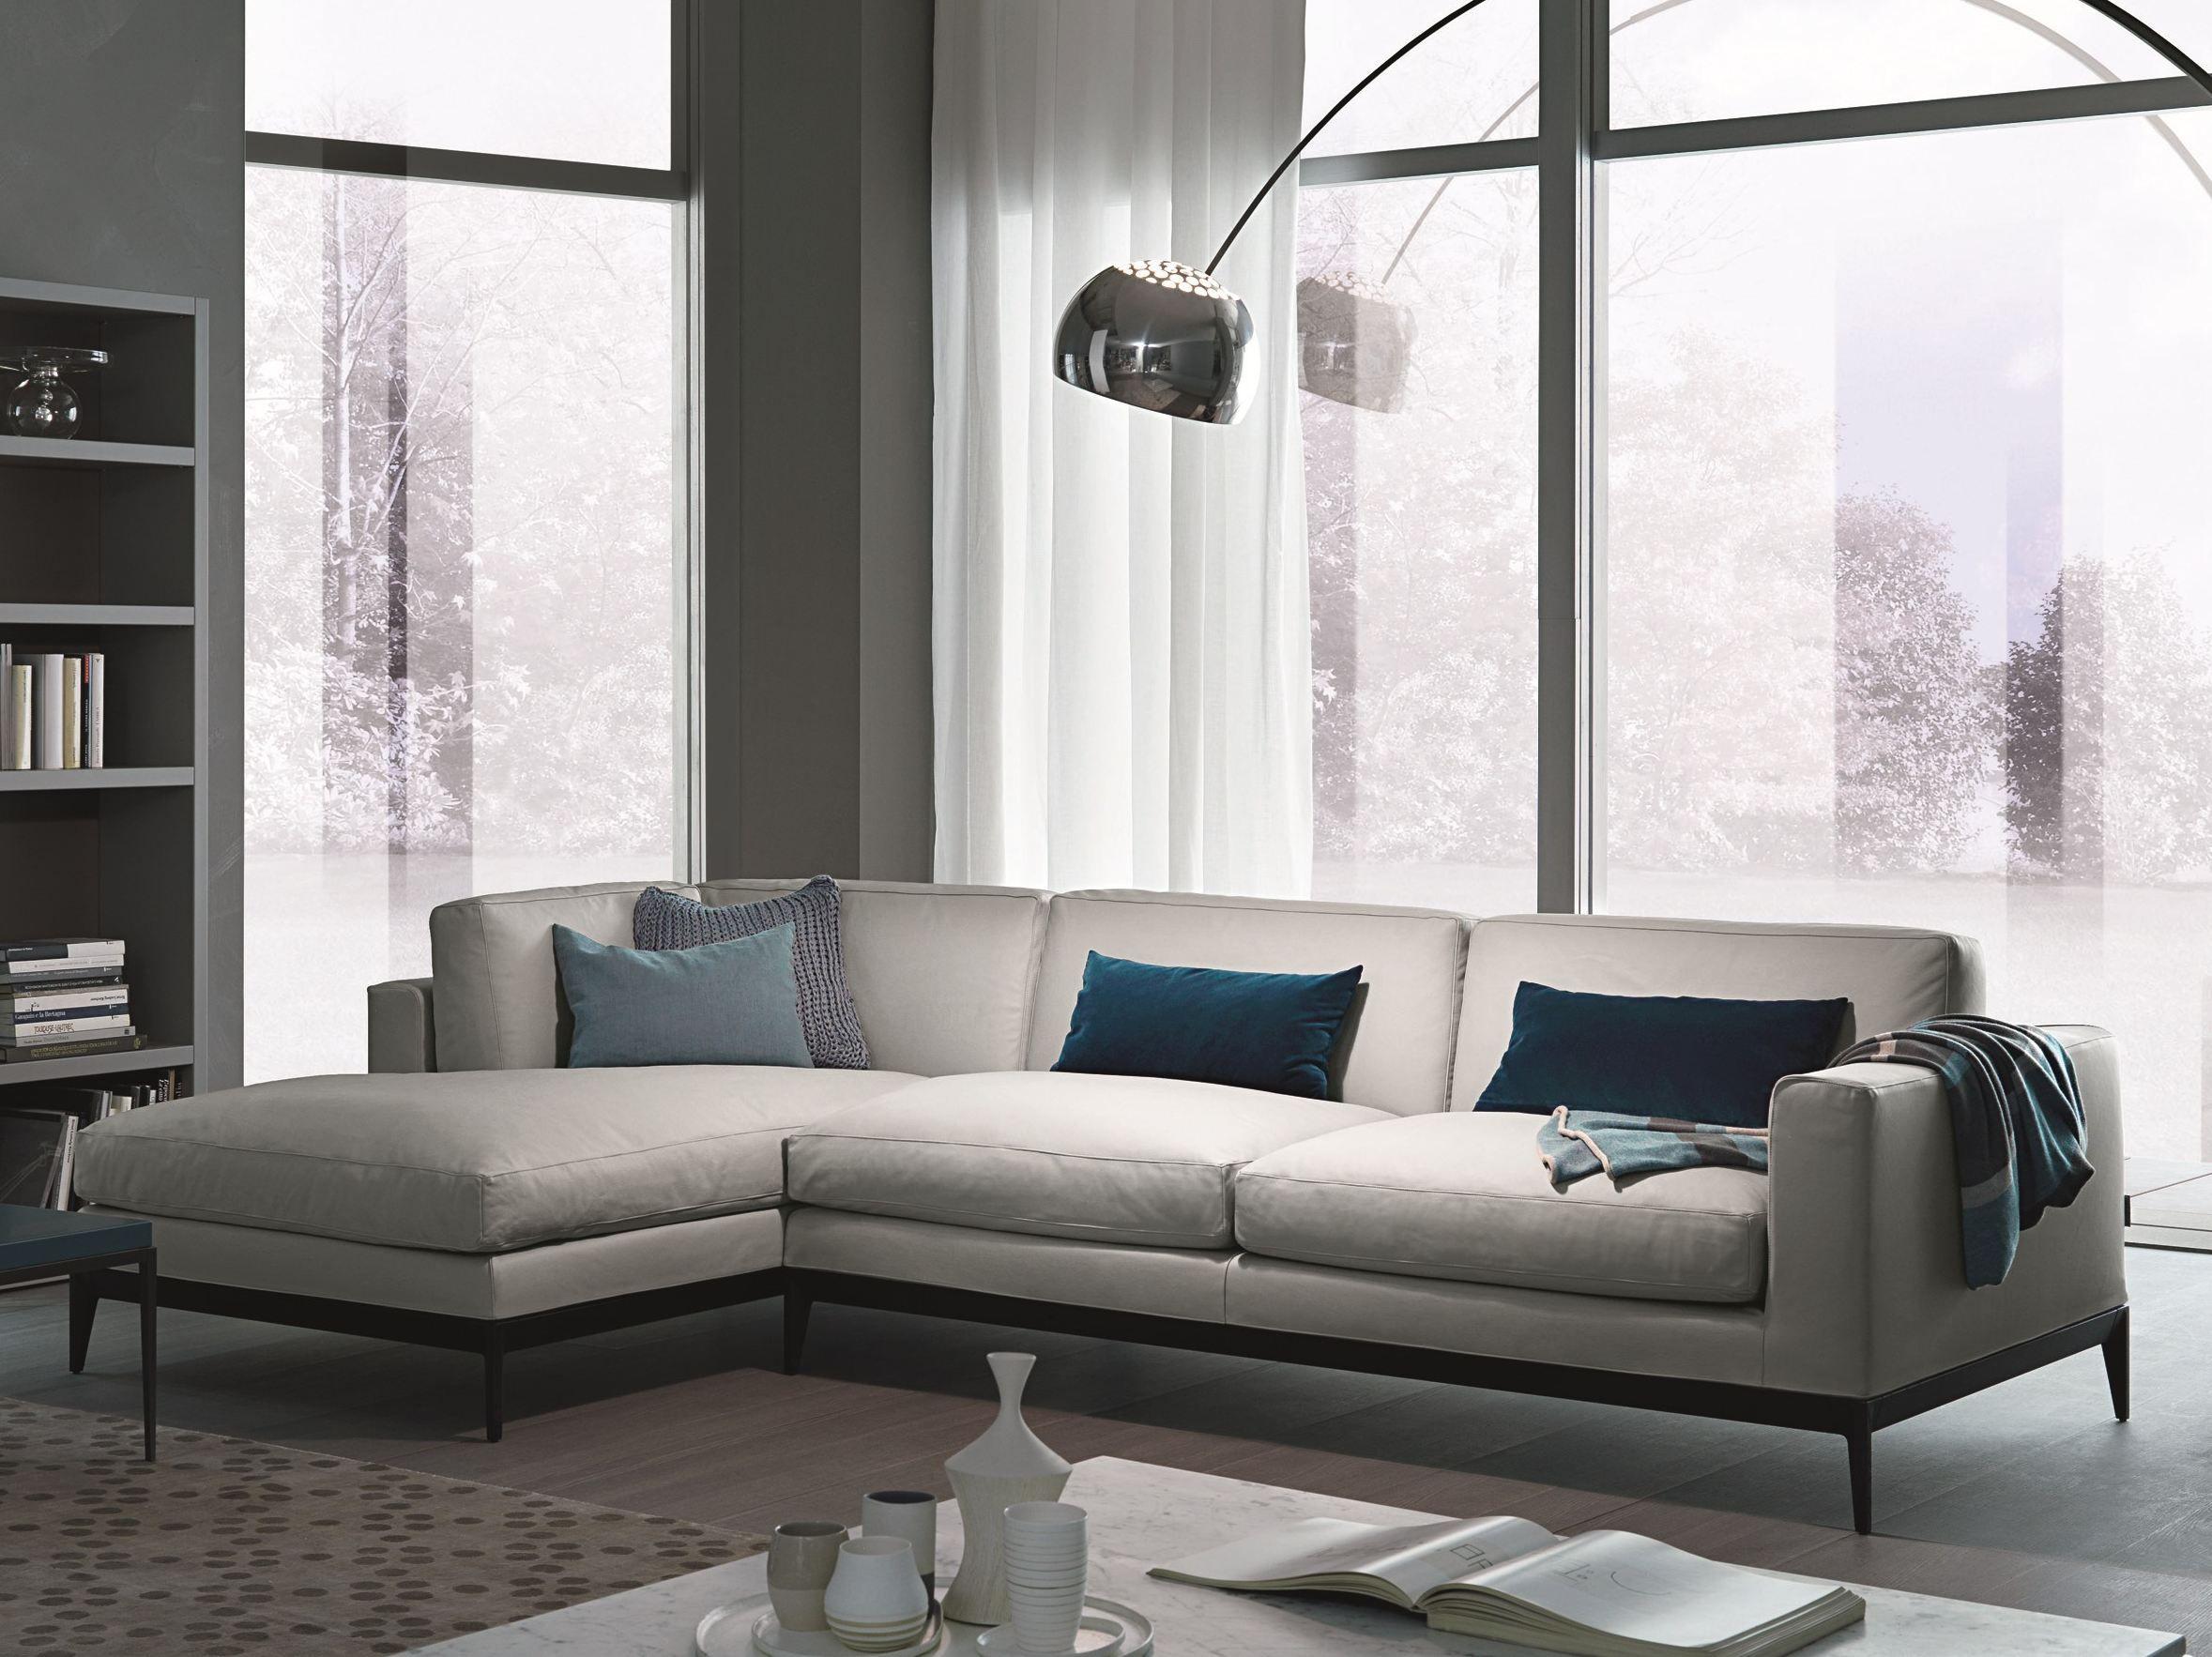 divano angolare componibile modulare in pelle antibes. Black Bedroom Furniture Sets. Home Design Ideas